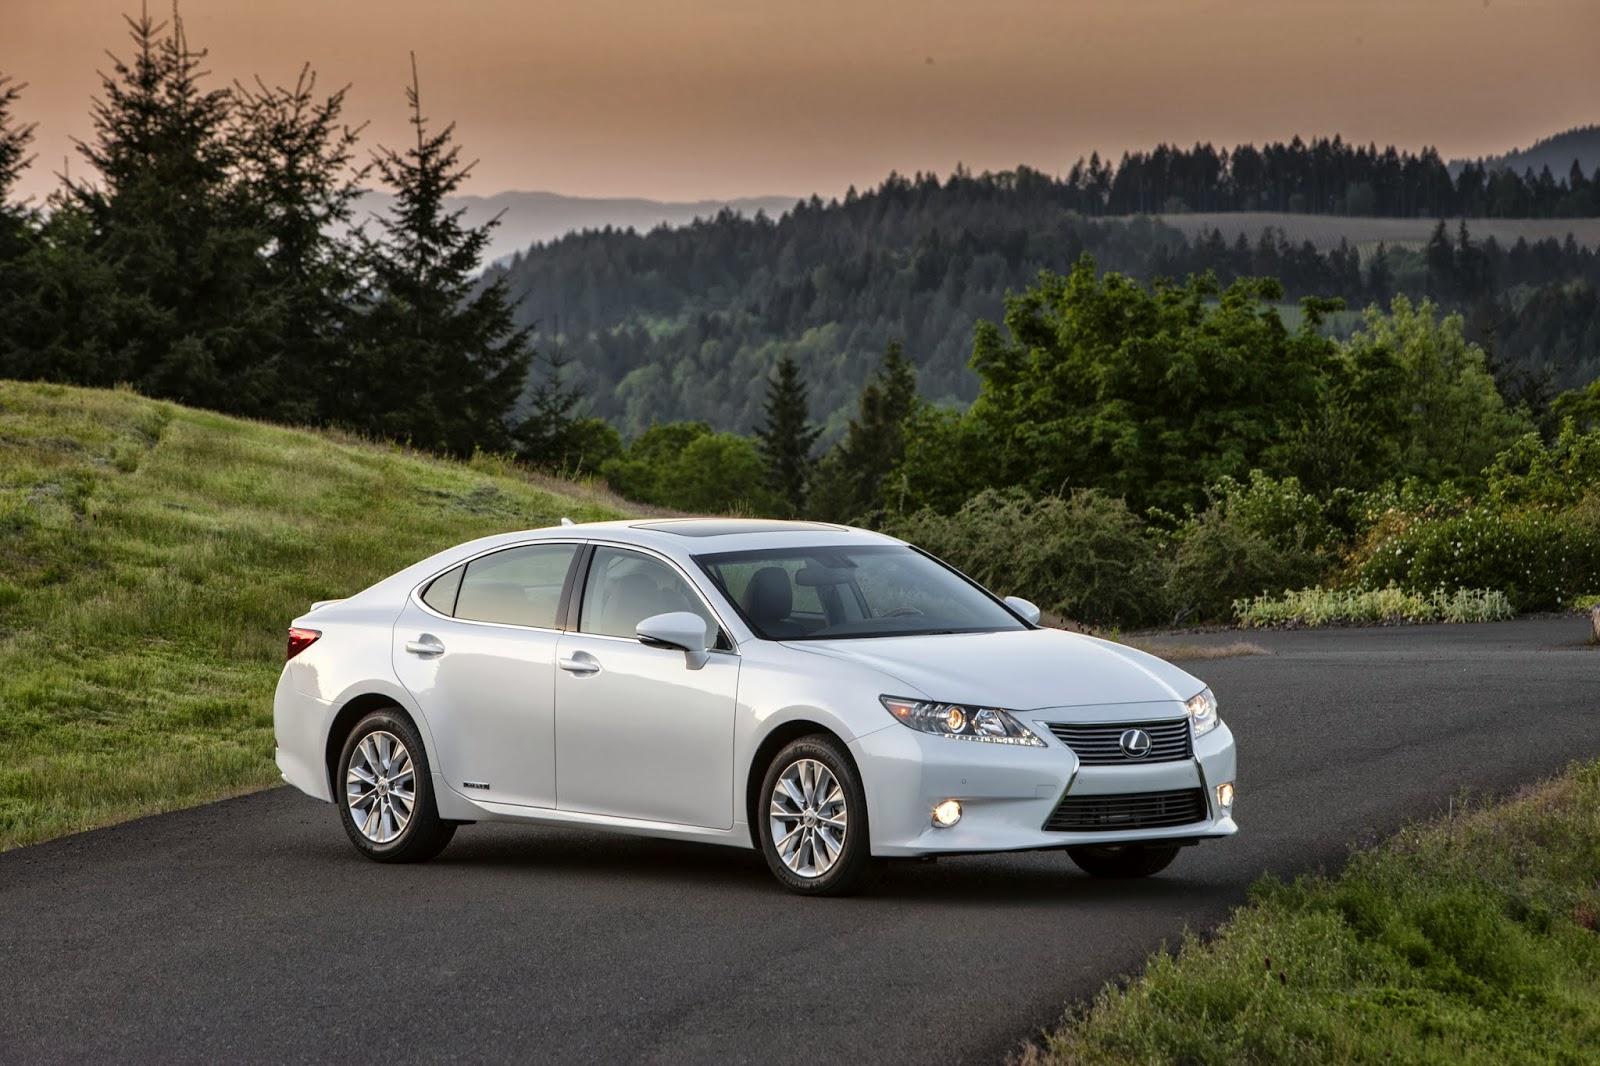 2014 Lexus ES 300h Hybrid Luxury Sedan Receives 40 Mpg EPA Estimated  Combined Fuel Economy